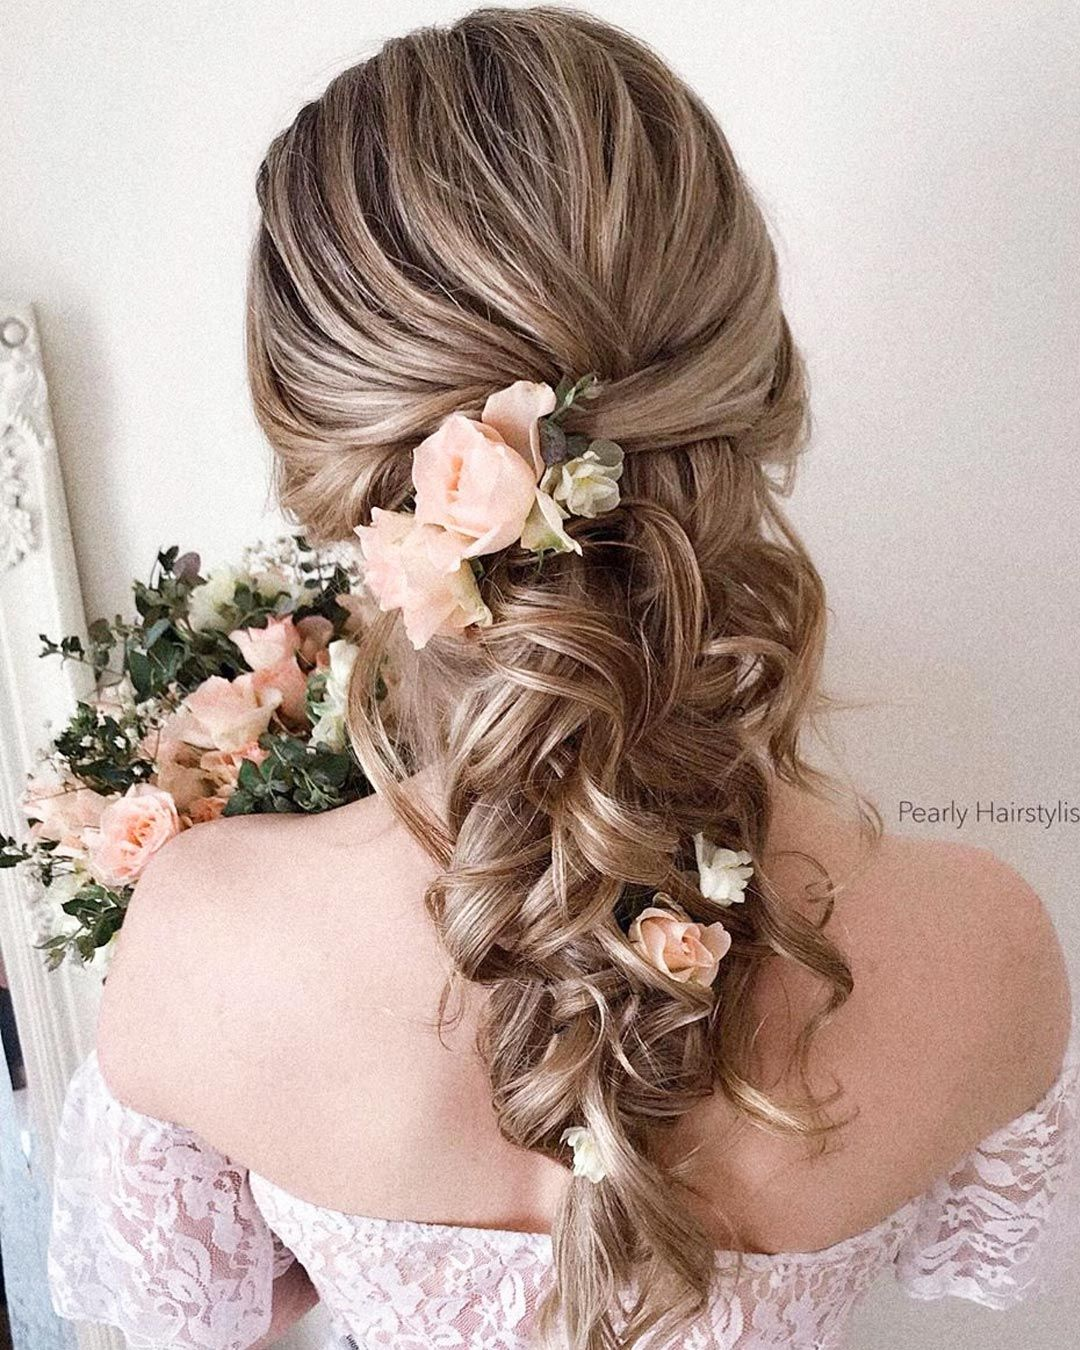 Wedding Hairstyles 2020 2021 Fantastic Hair Ideas In 2020 Hair Styles Bride Hairstyles Wedding Hair Inspiration